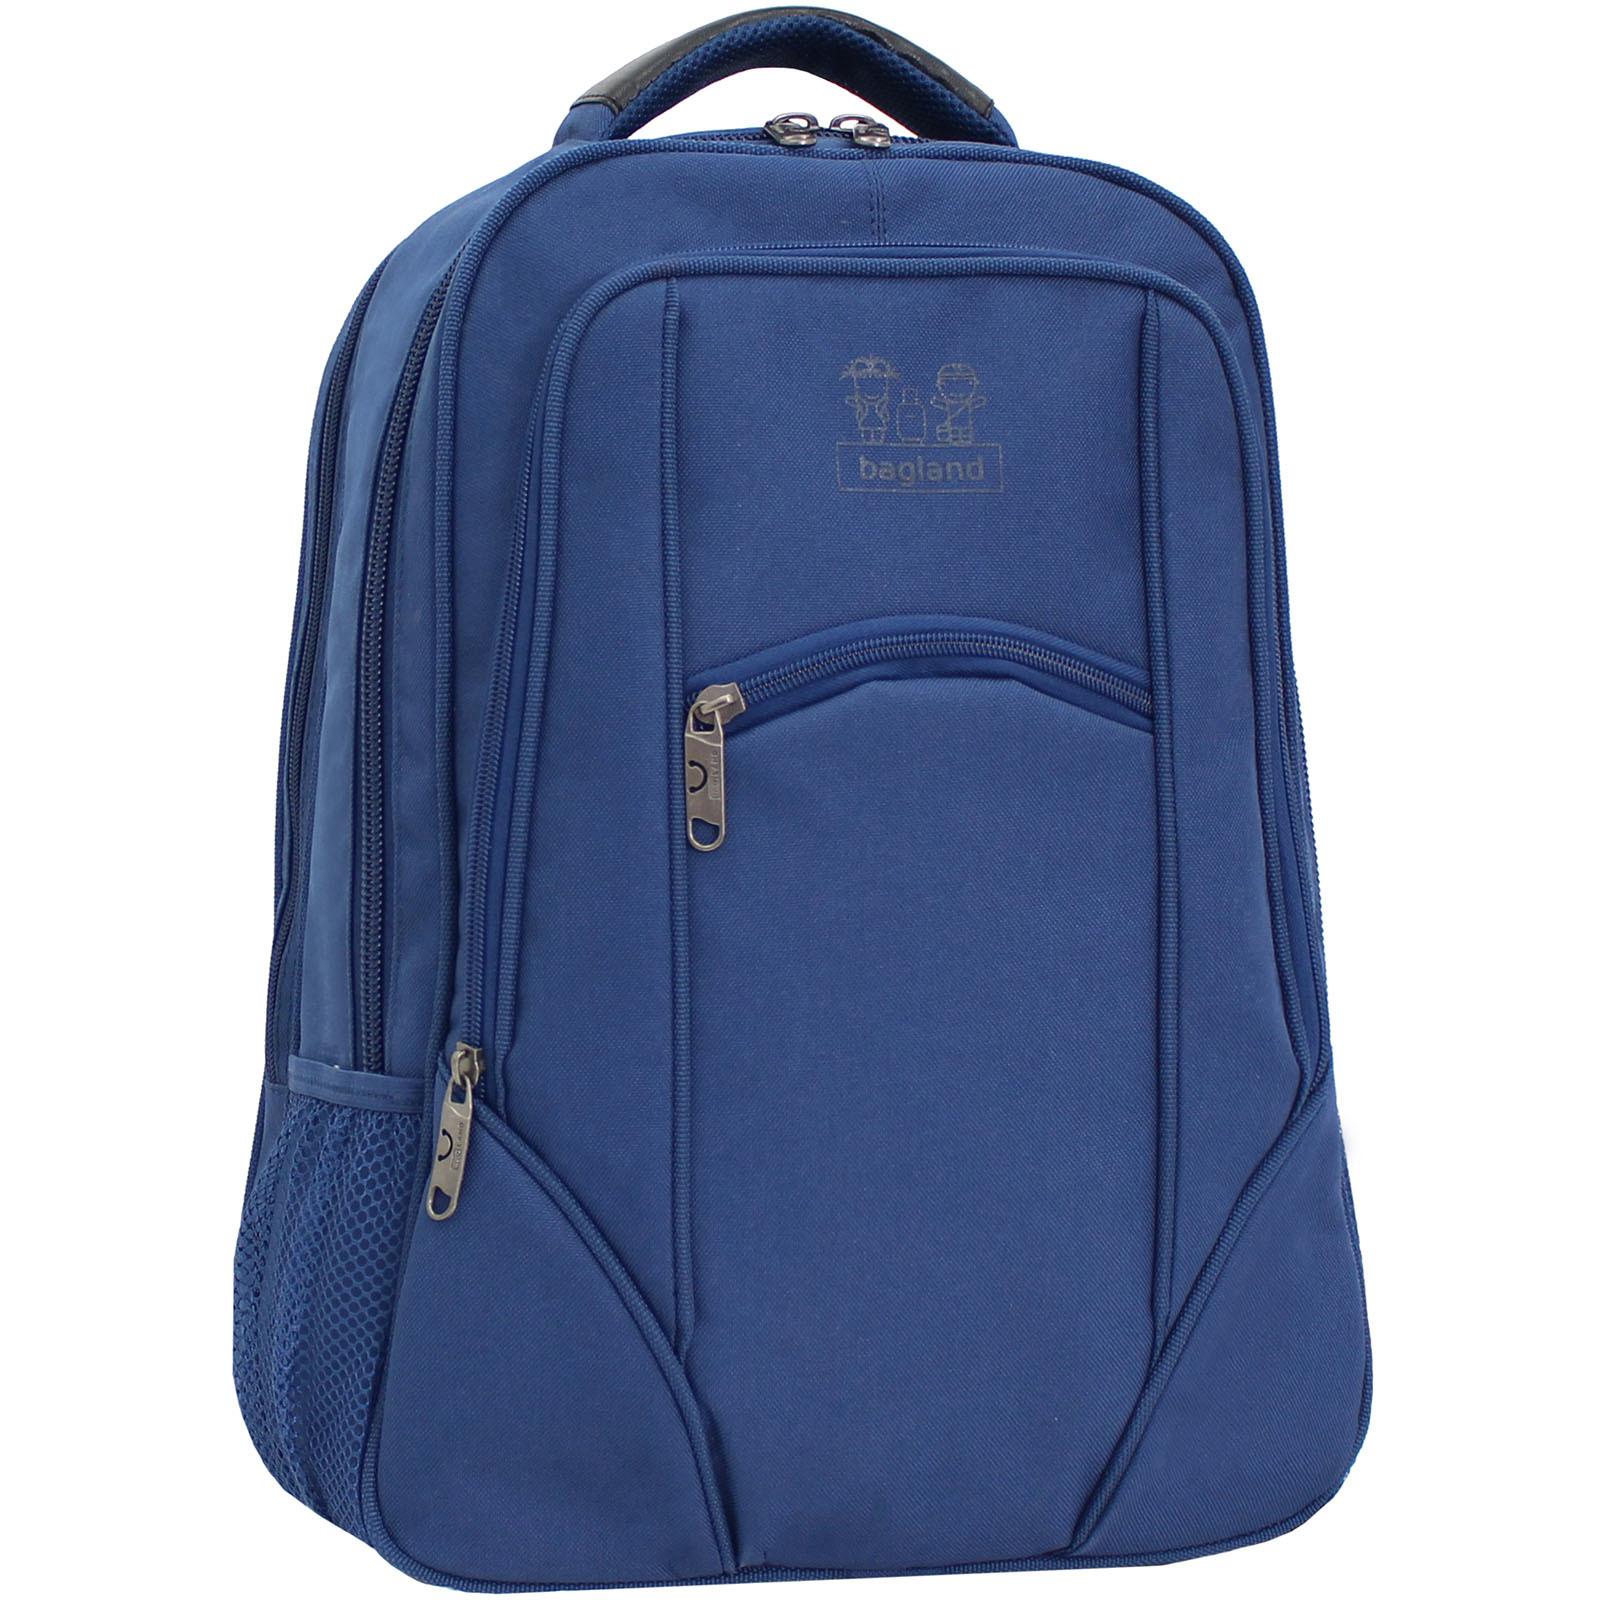 Рюкзаки для ноутбука Рюкзак для ноутбука Bagland Рюкзак под ноутбук 537 21 л. Синий (0053766) IMG_9972.JPG